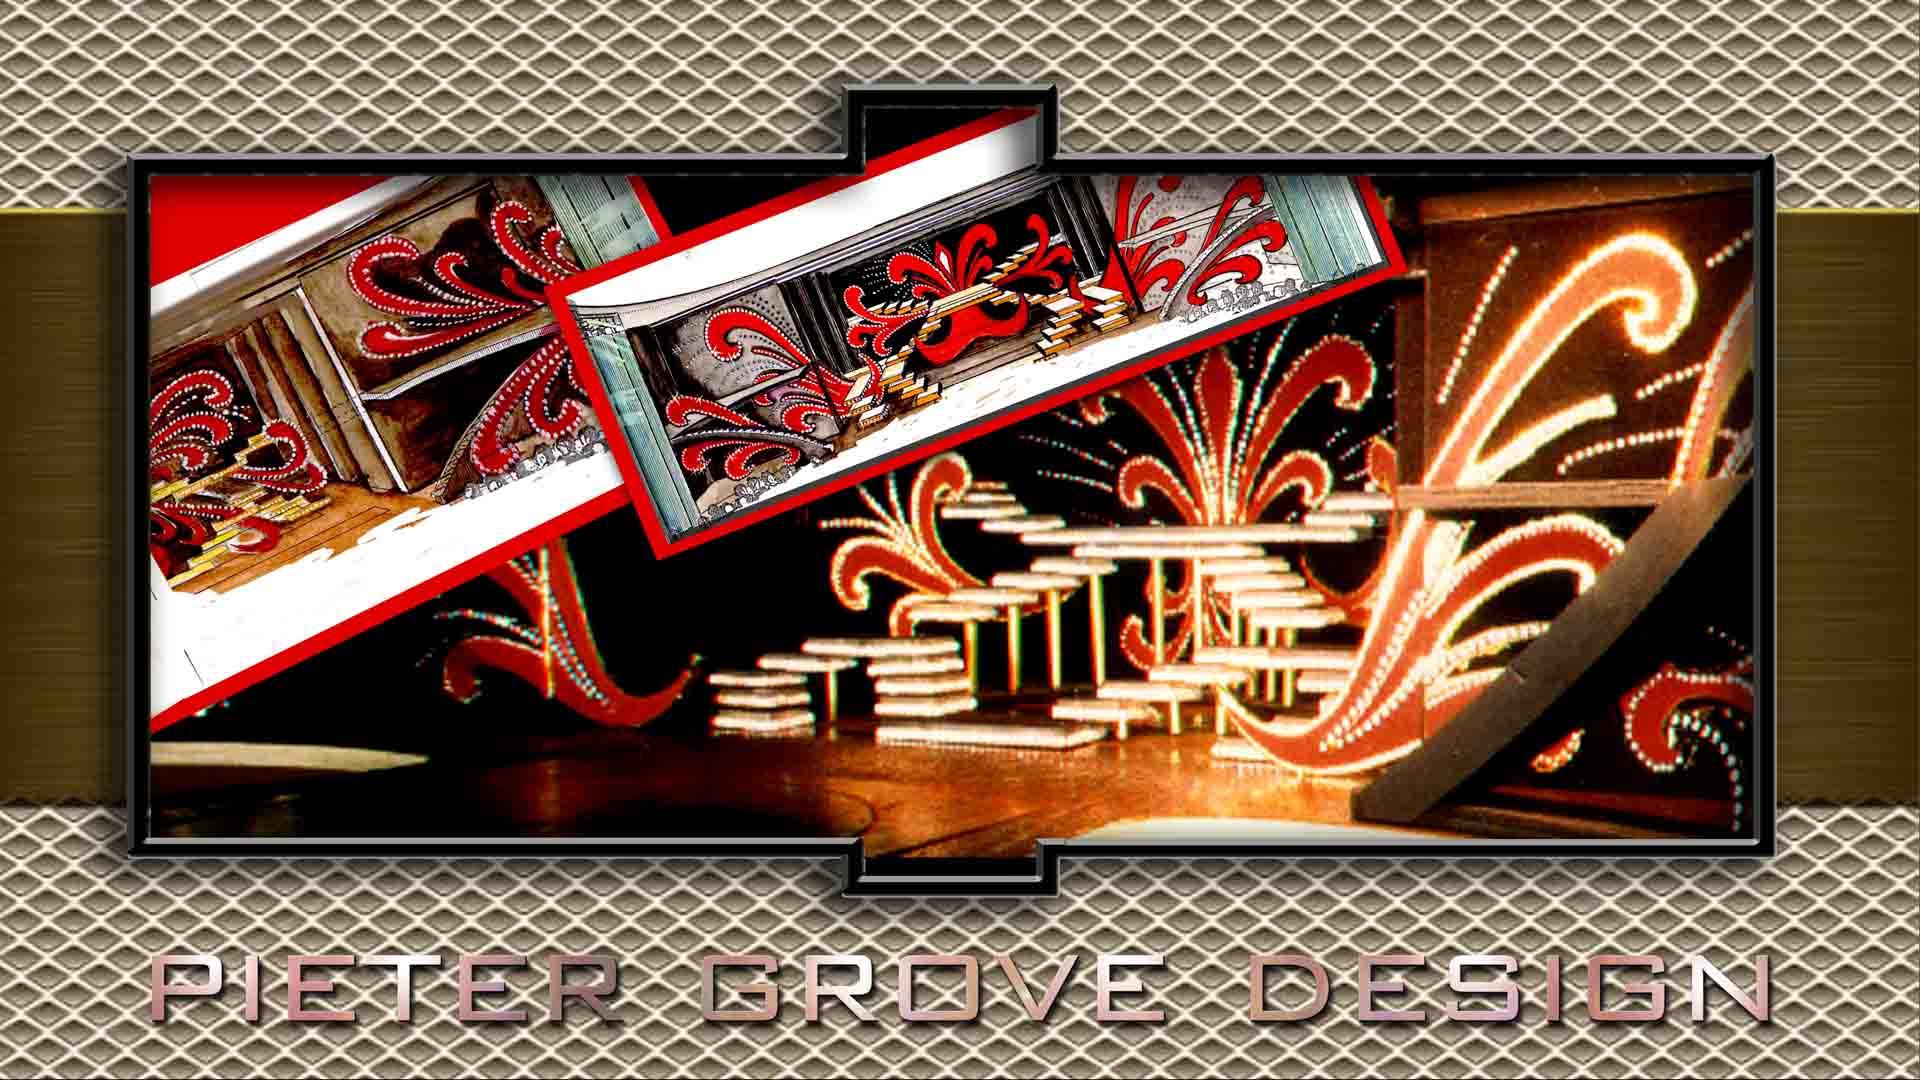 SET DESIGN MODEL - KA-LIDO-SCOPE_1 - Pieter Grove - LAS VEGAS